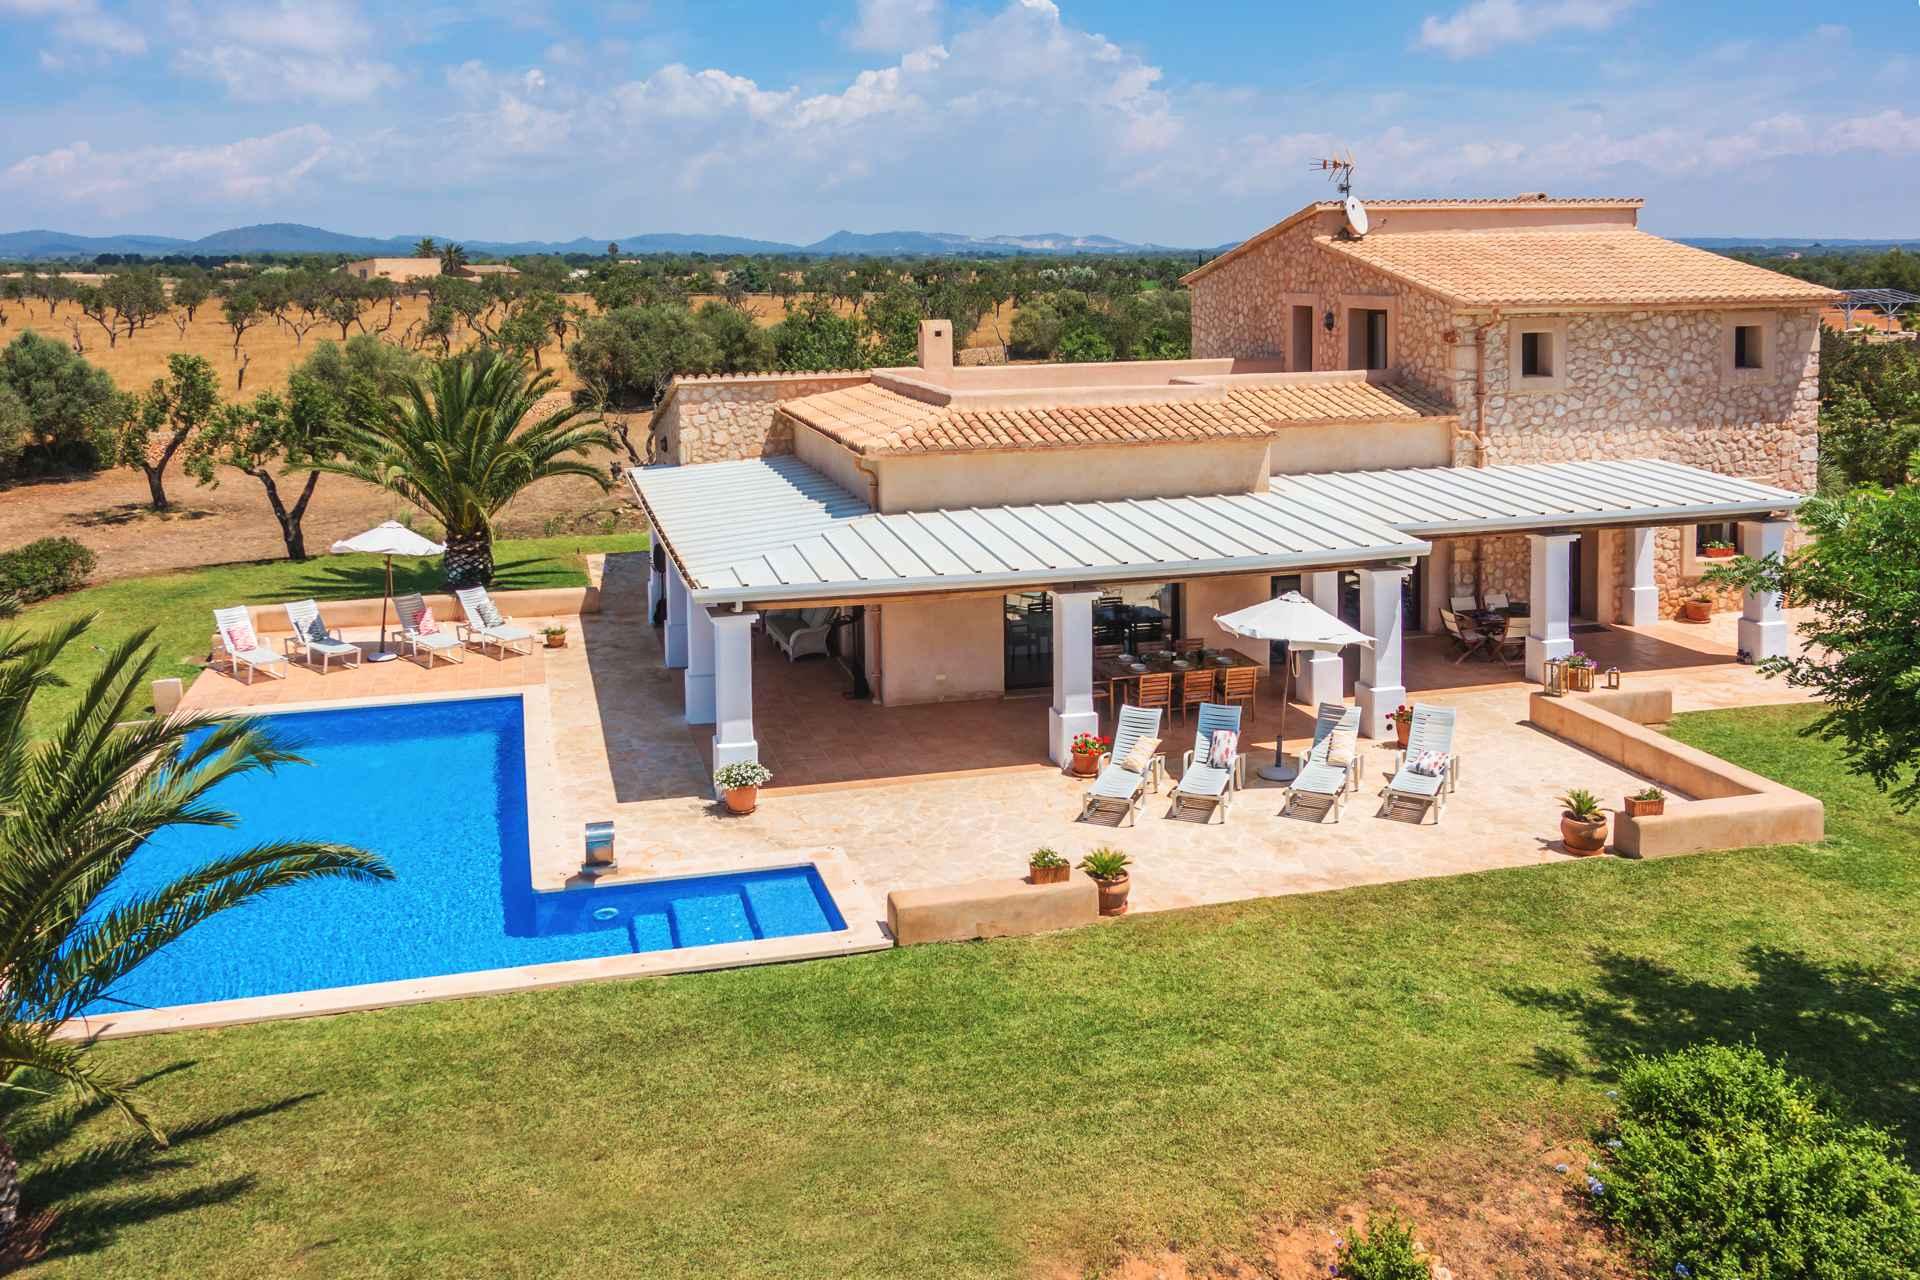 01-05 Mediterrane Finca Mallorca Süden Bild 1